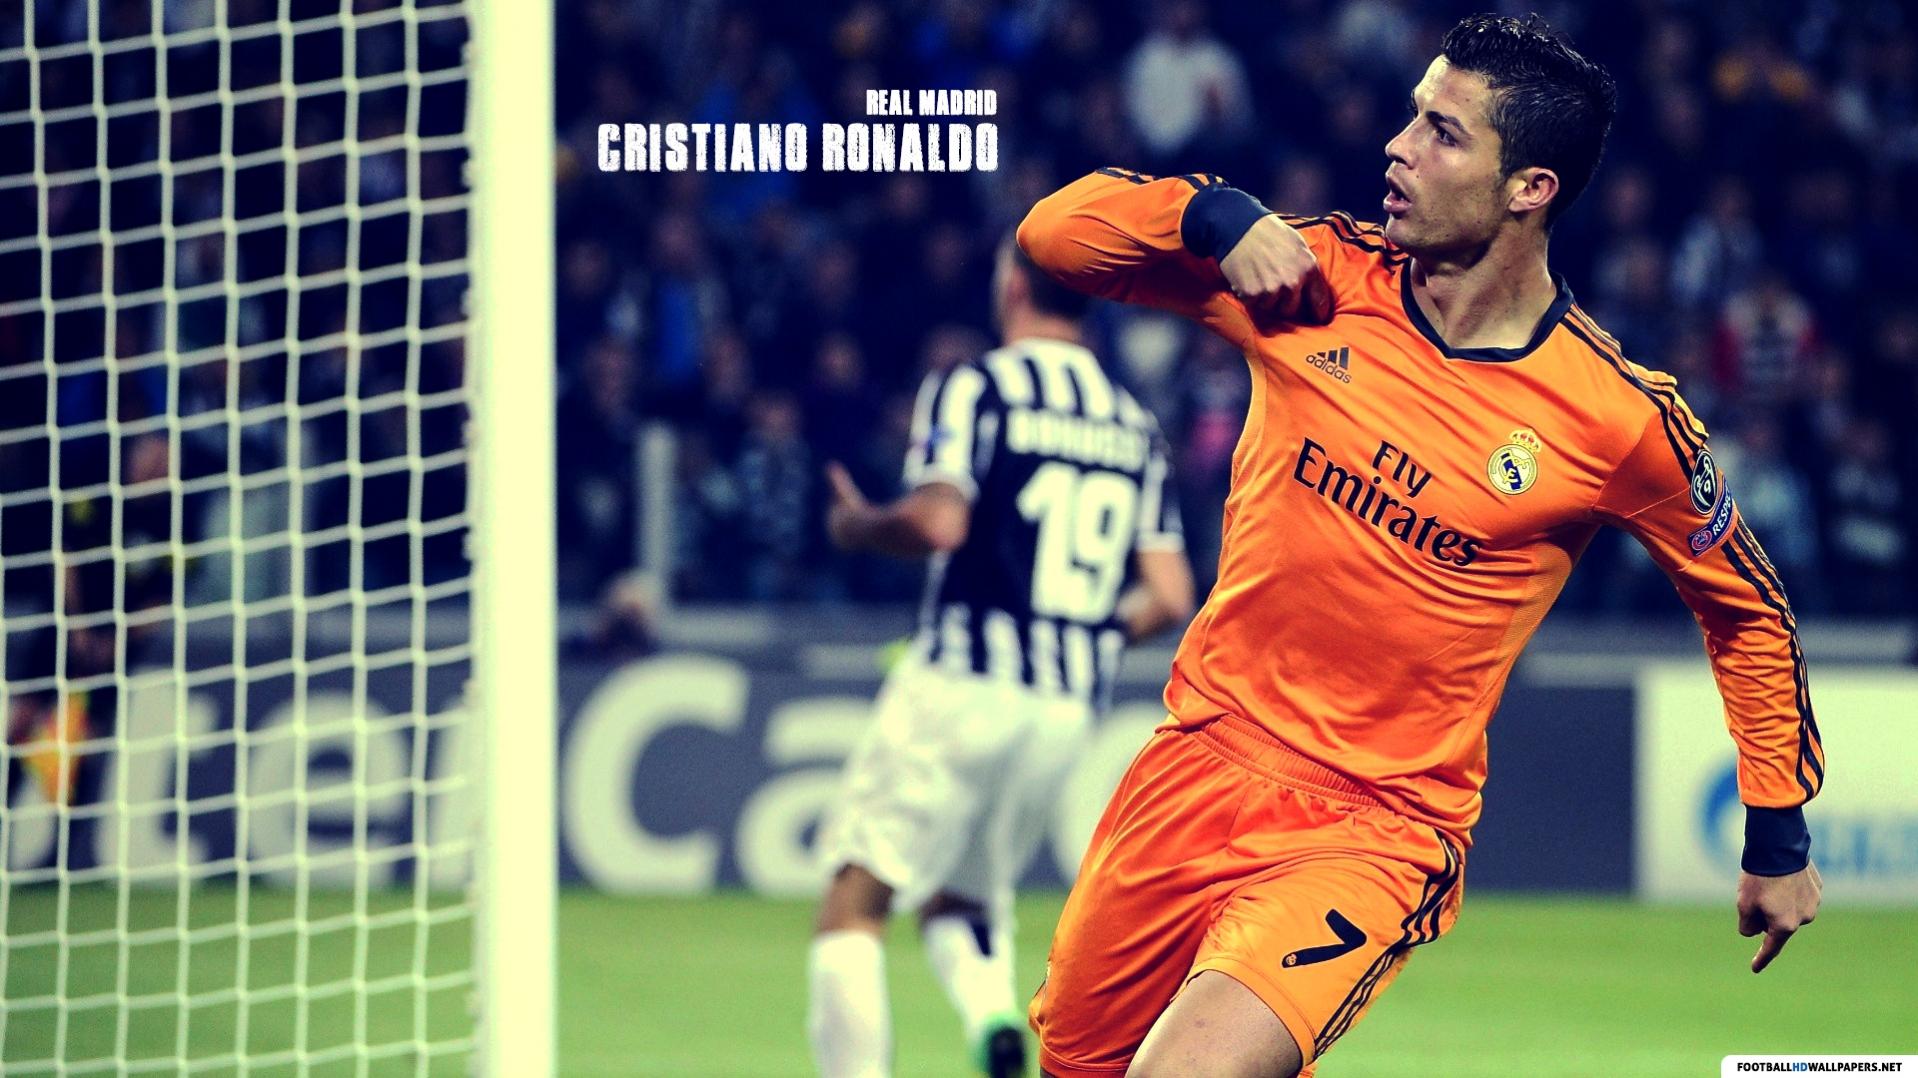 cristiano ronaldo goal real madrid hd football wallpapers 1918x1078